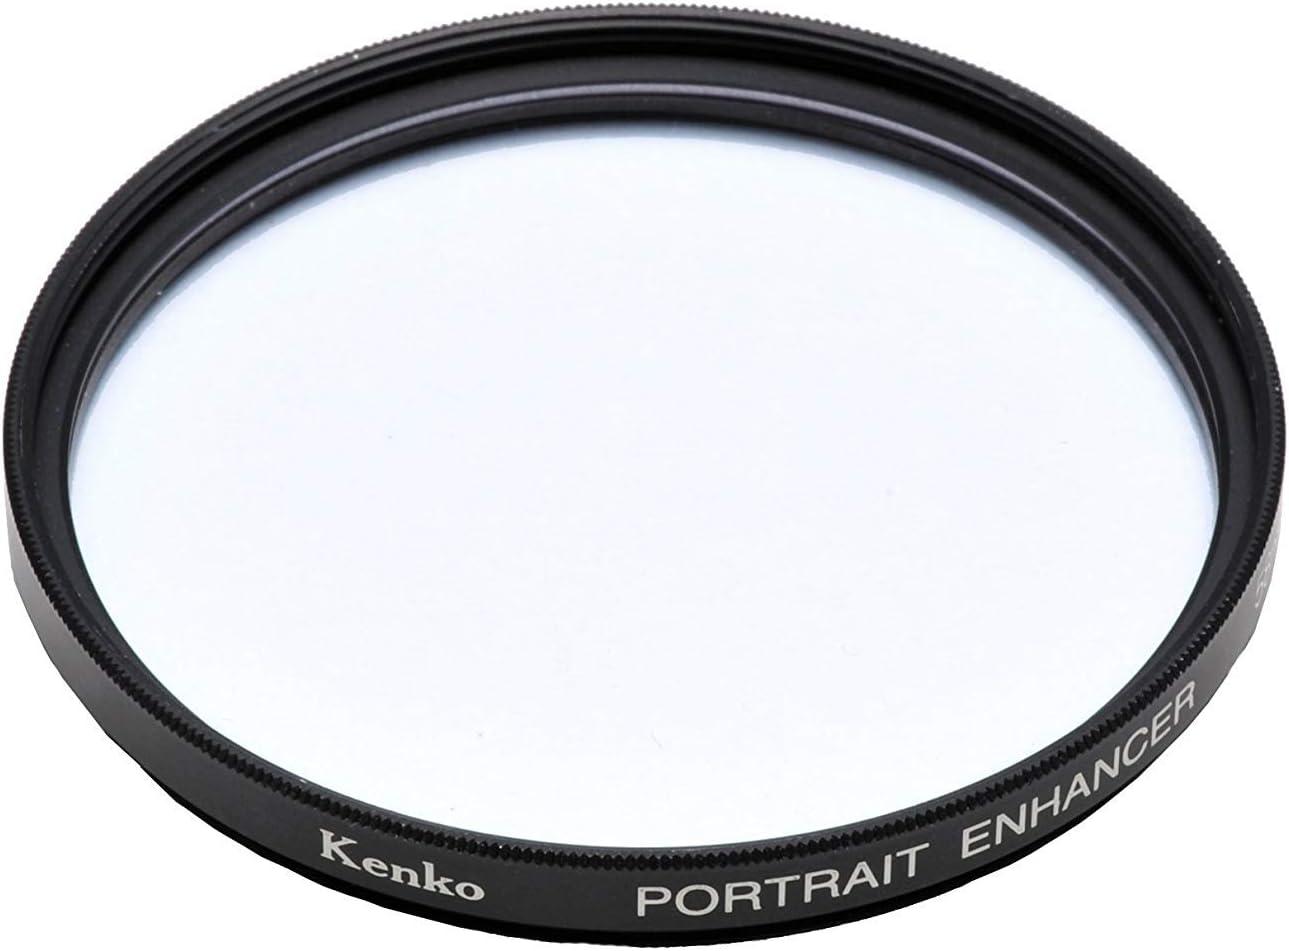 Kenko 55mm Red Enhancer No.1 Camera Lens Filters